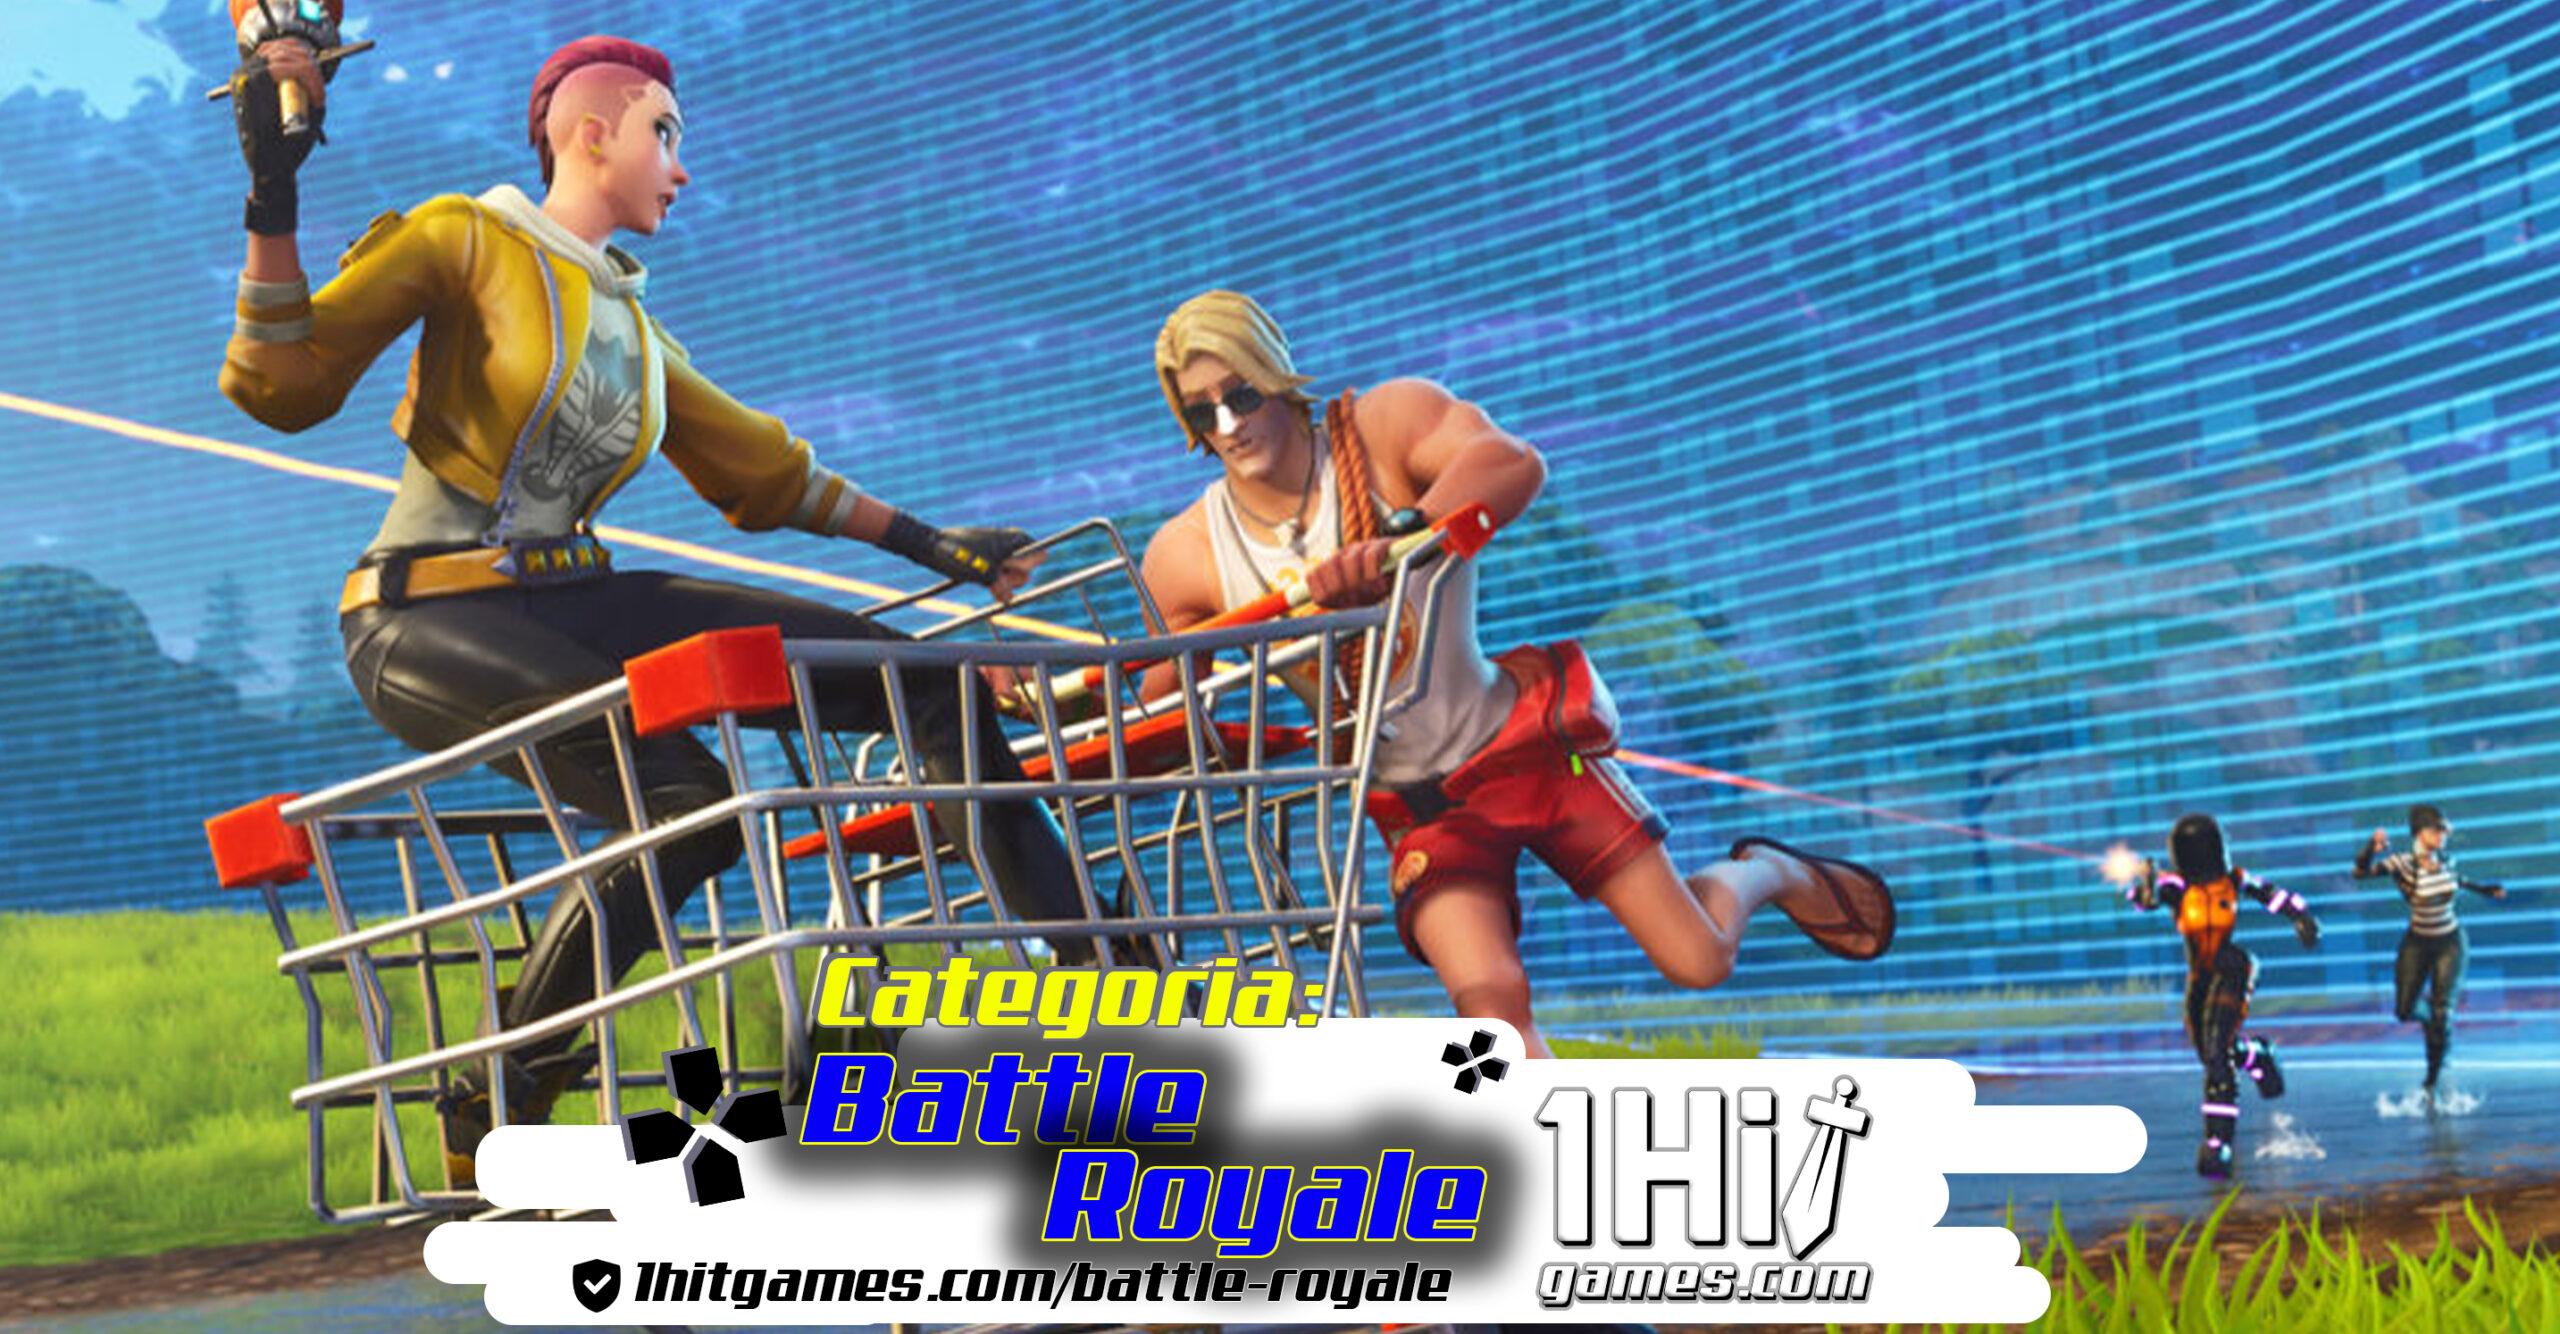 battle royale Fortnite mapa fechando 1hitgames categorias online gamers